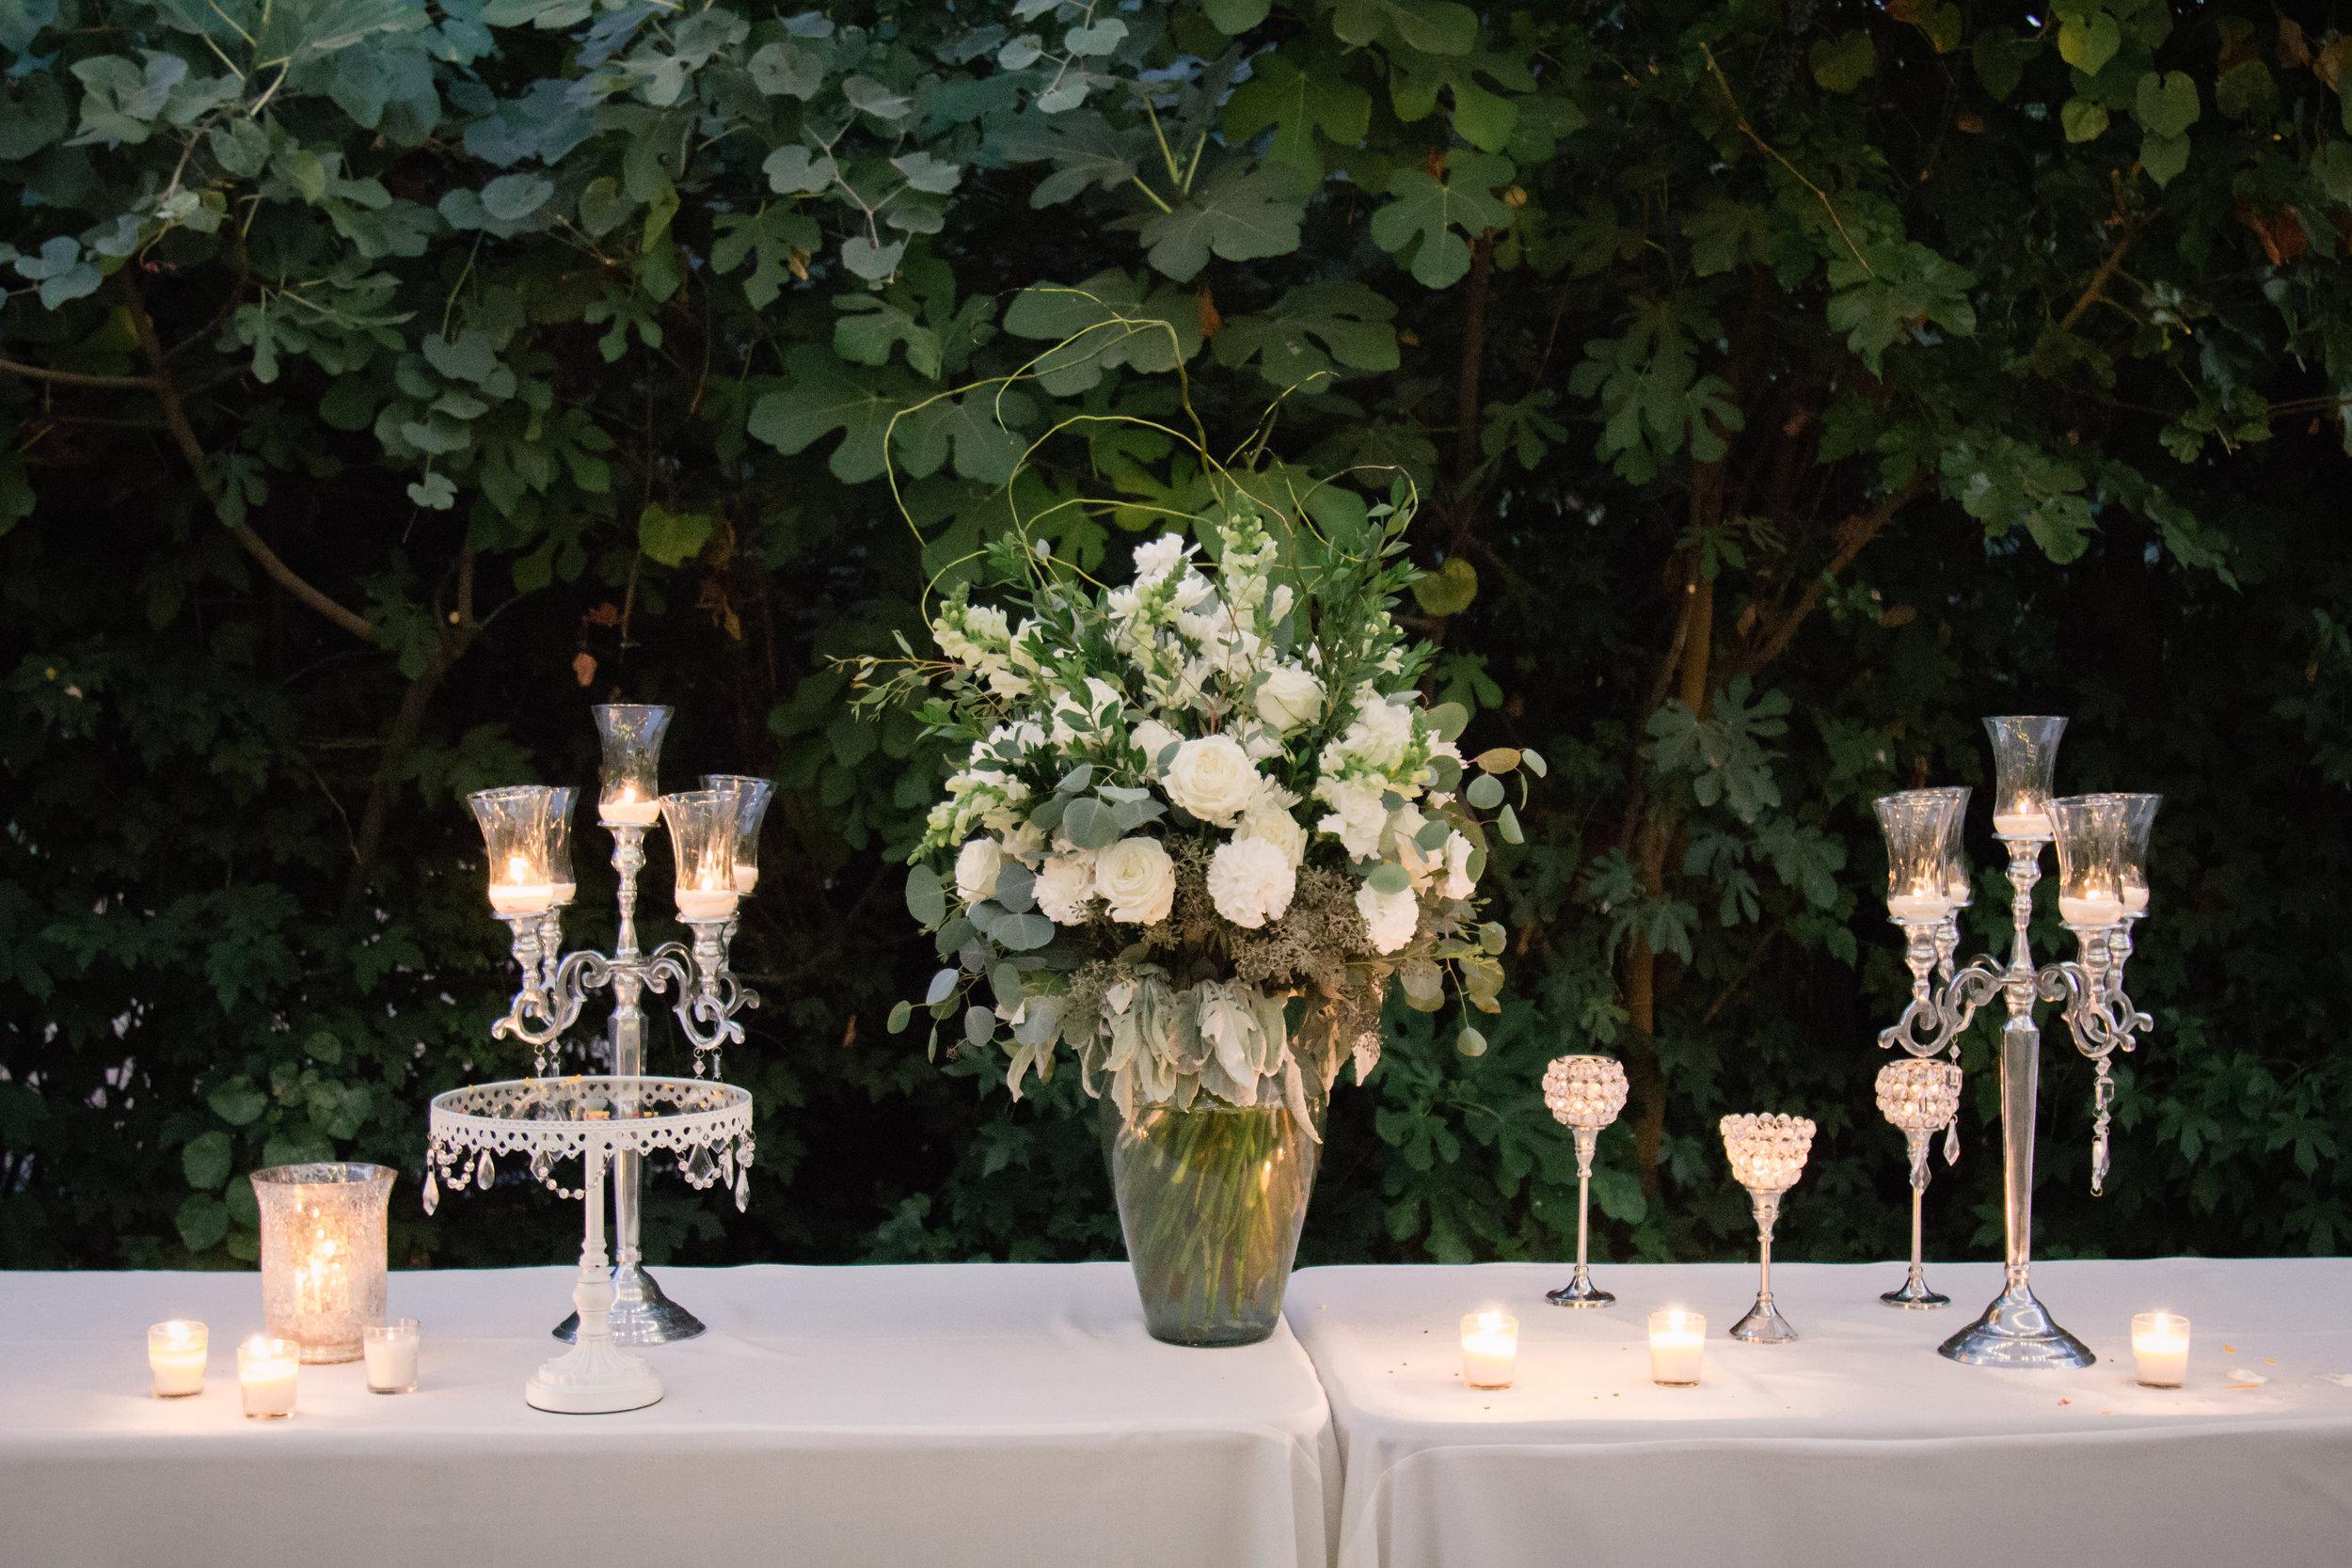 White Ranch Events - Chico - Ashley Teasley Photography - Sacramento Wedding Photographer 36.JPG